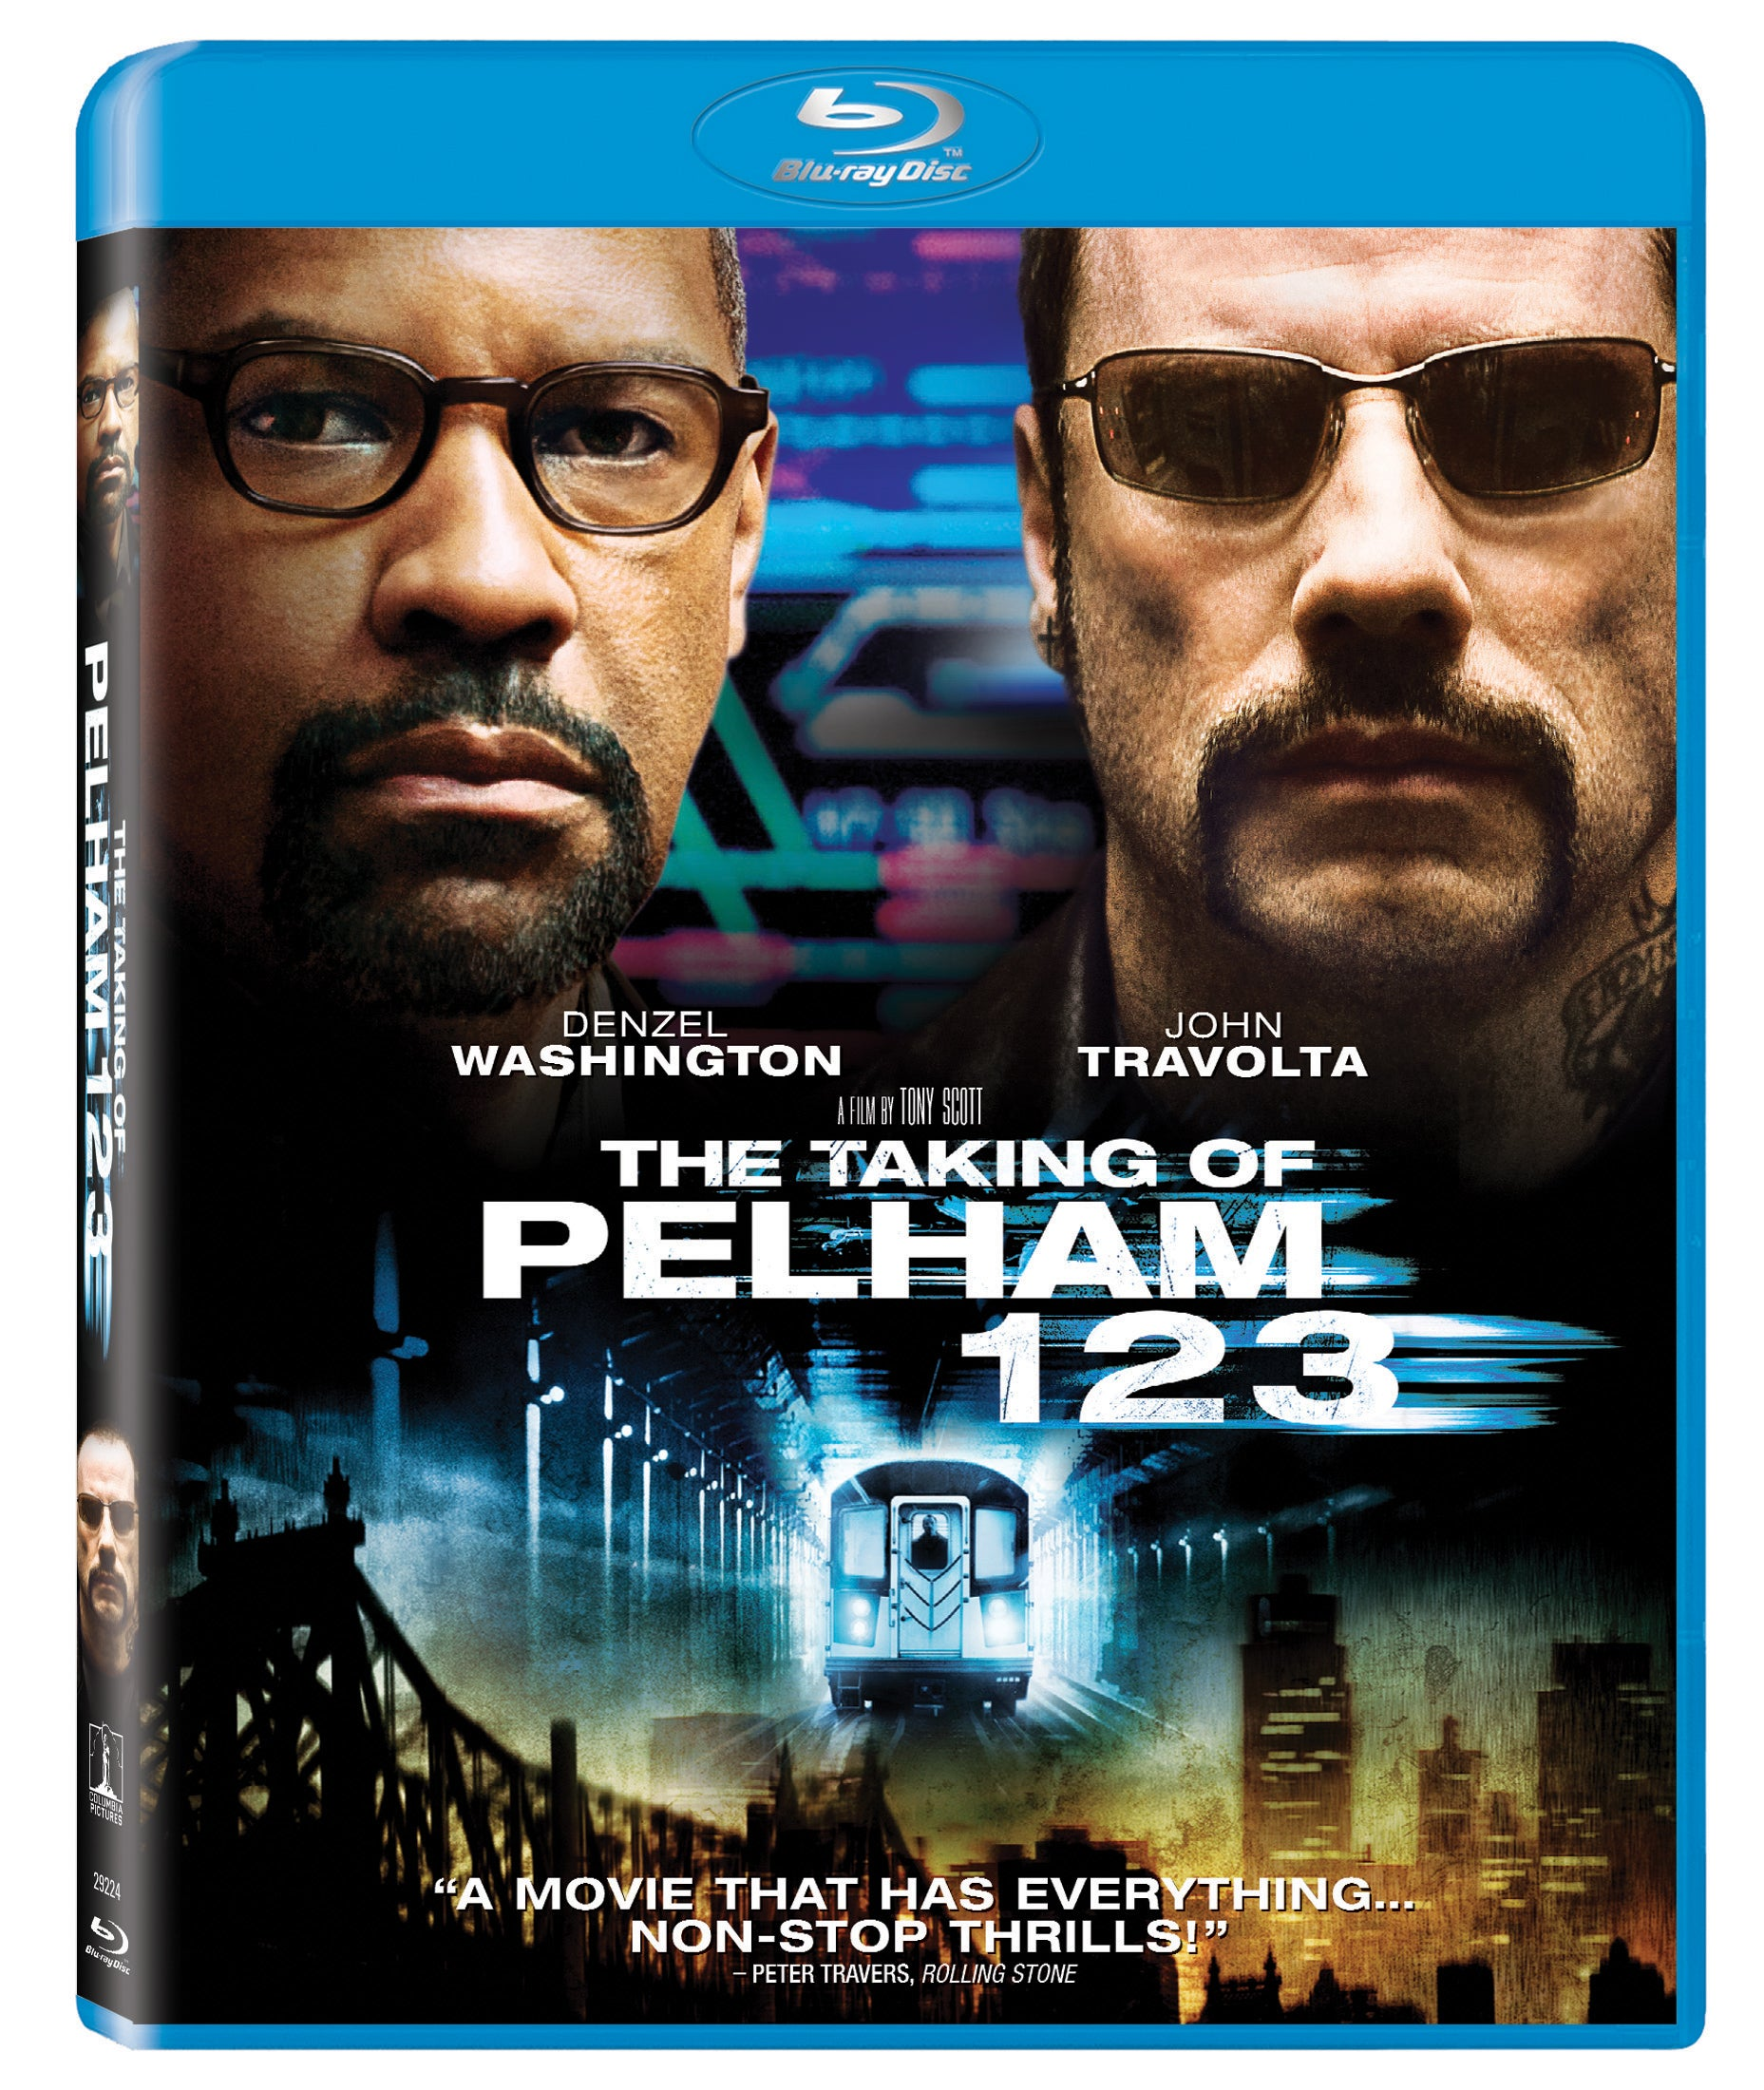 The Taking of Pelham 123 (Blu-ray Disc)